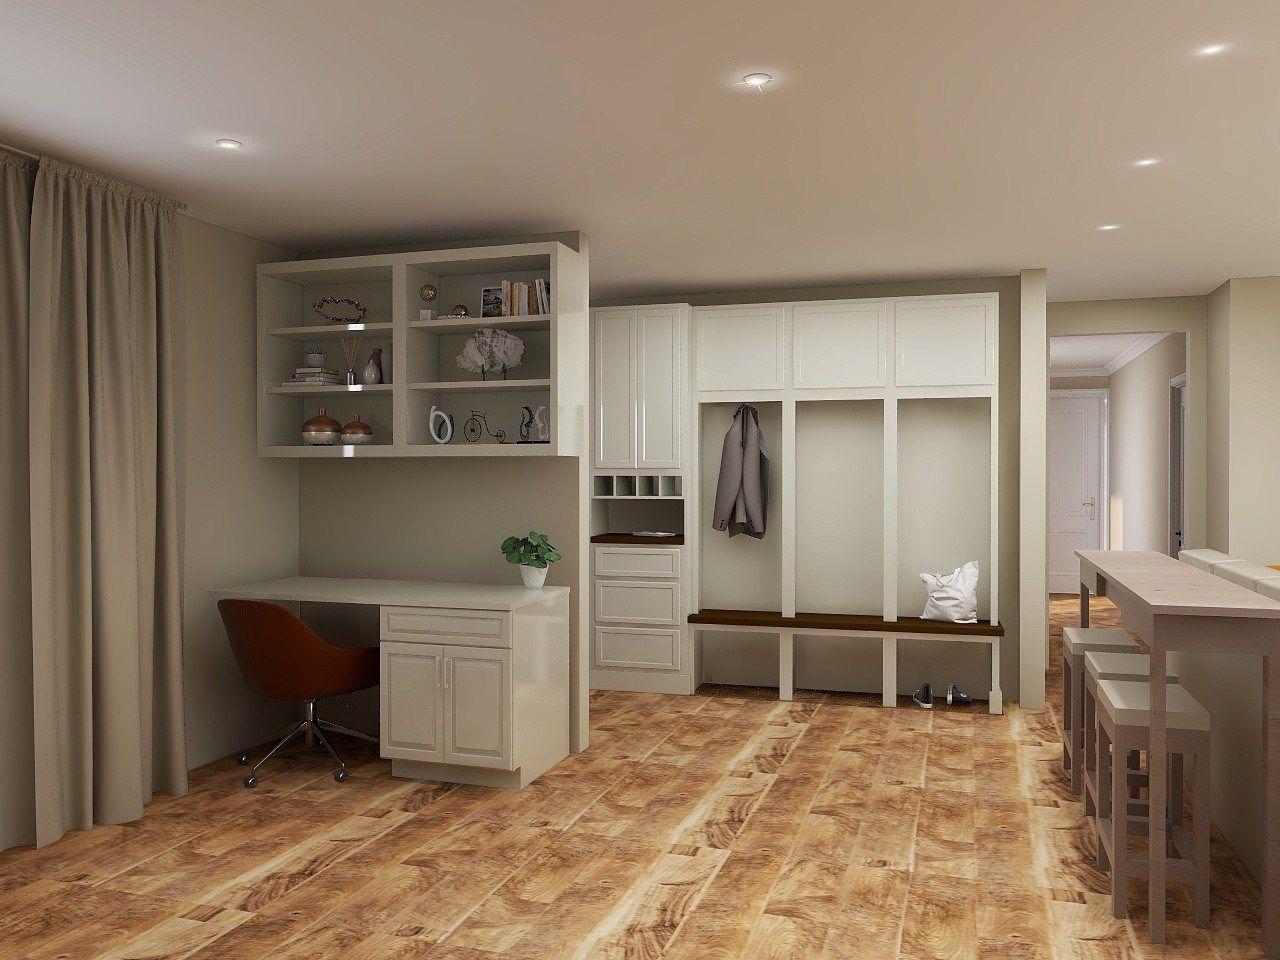 entryway mudroom storage unit built-in office desk space open concept ranch home renovation